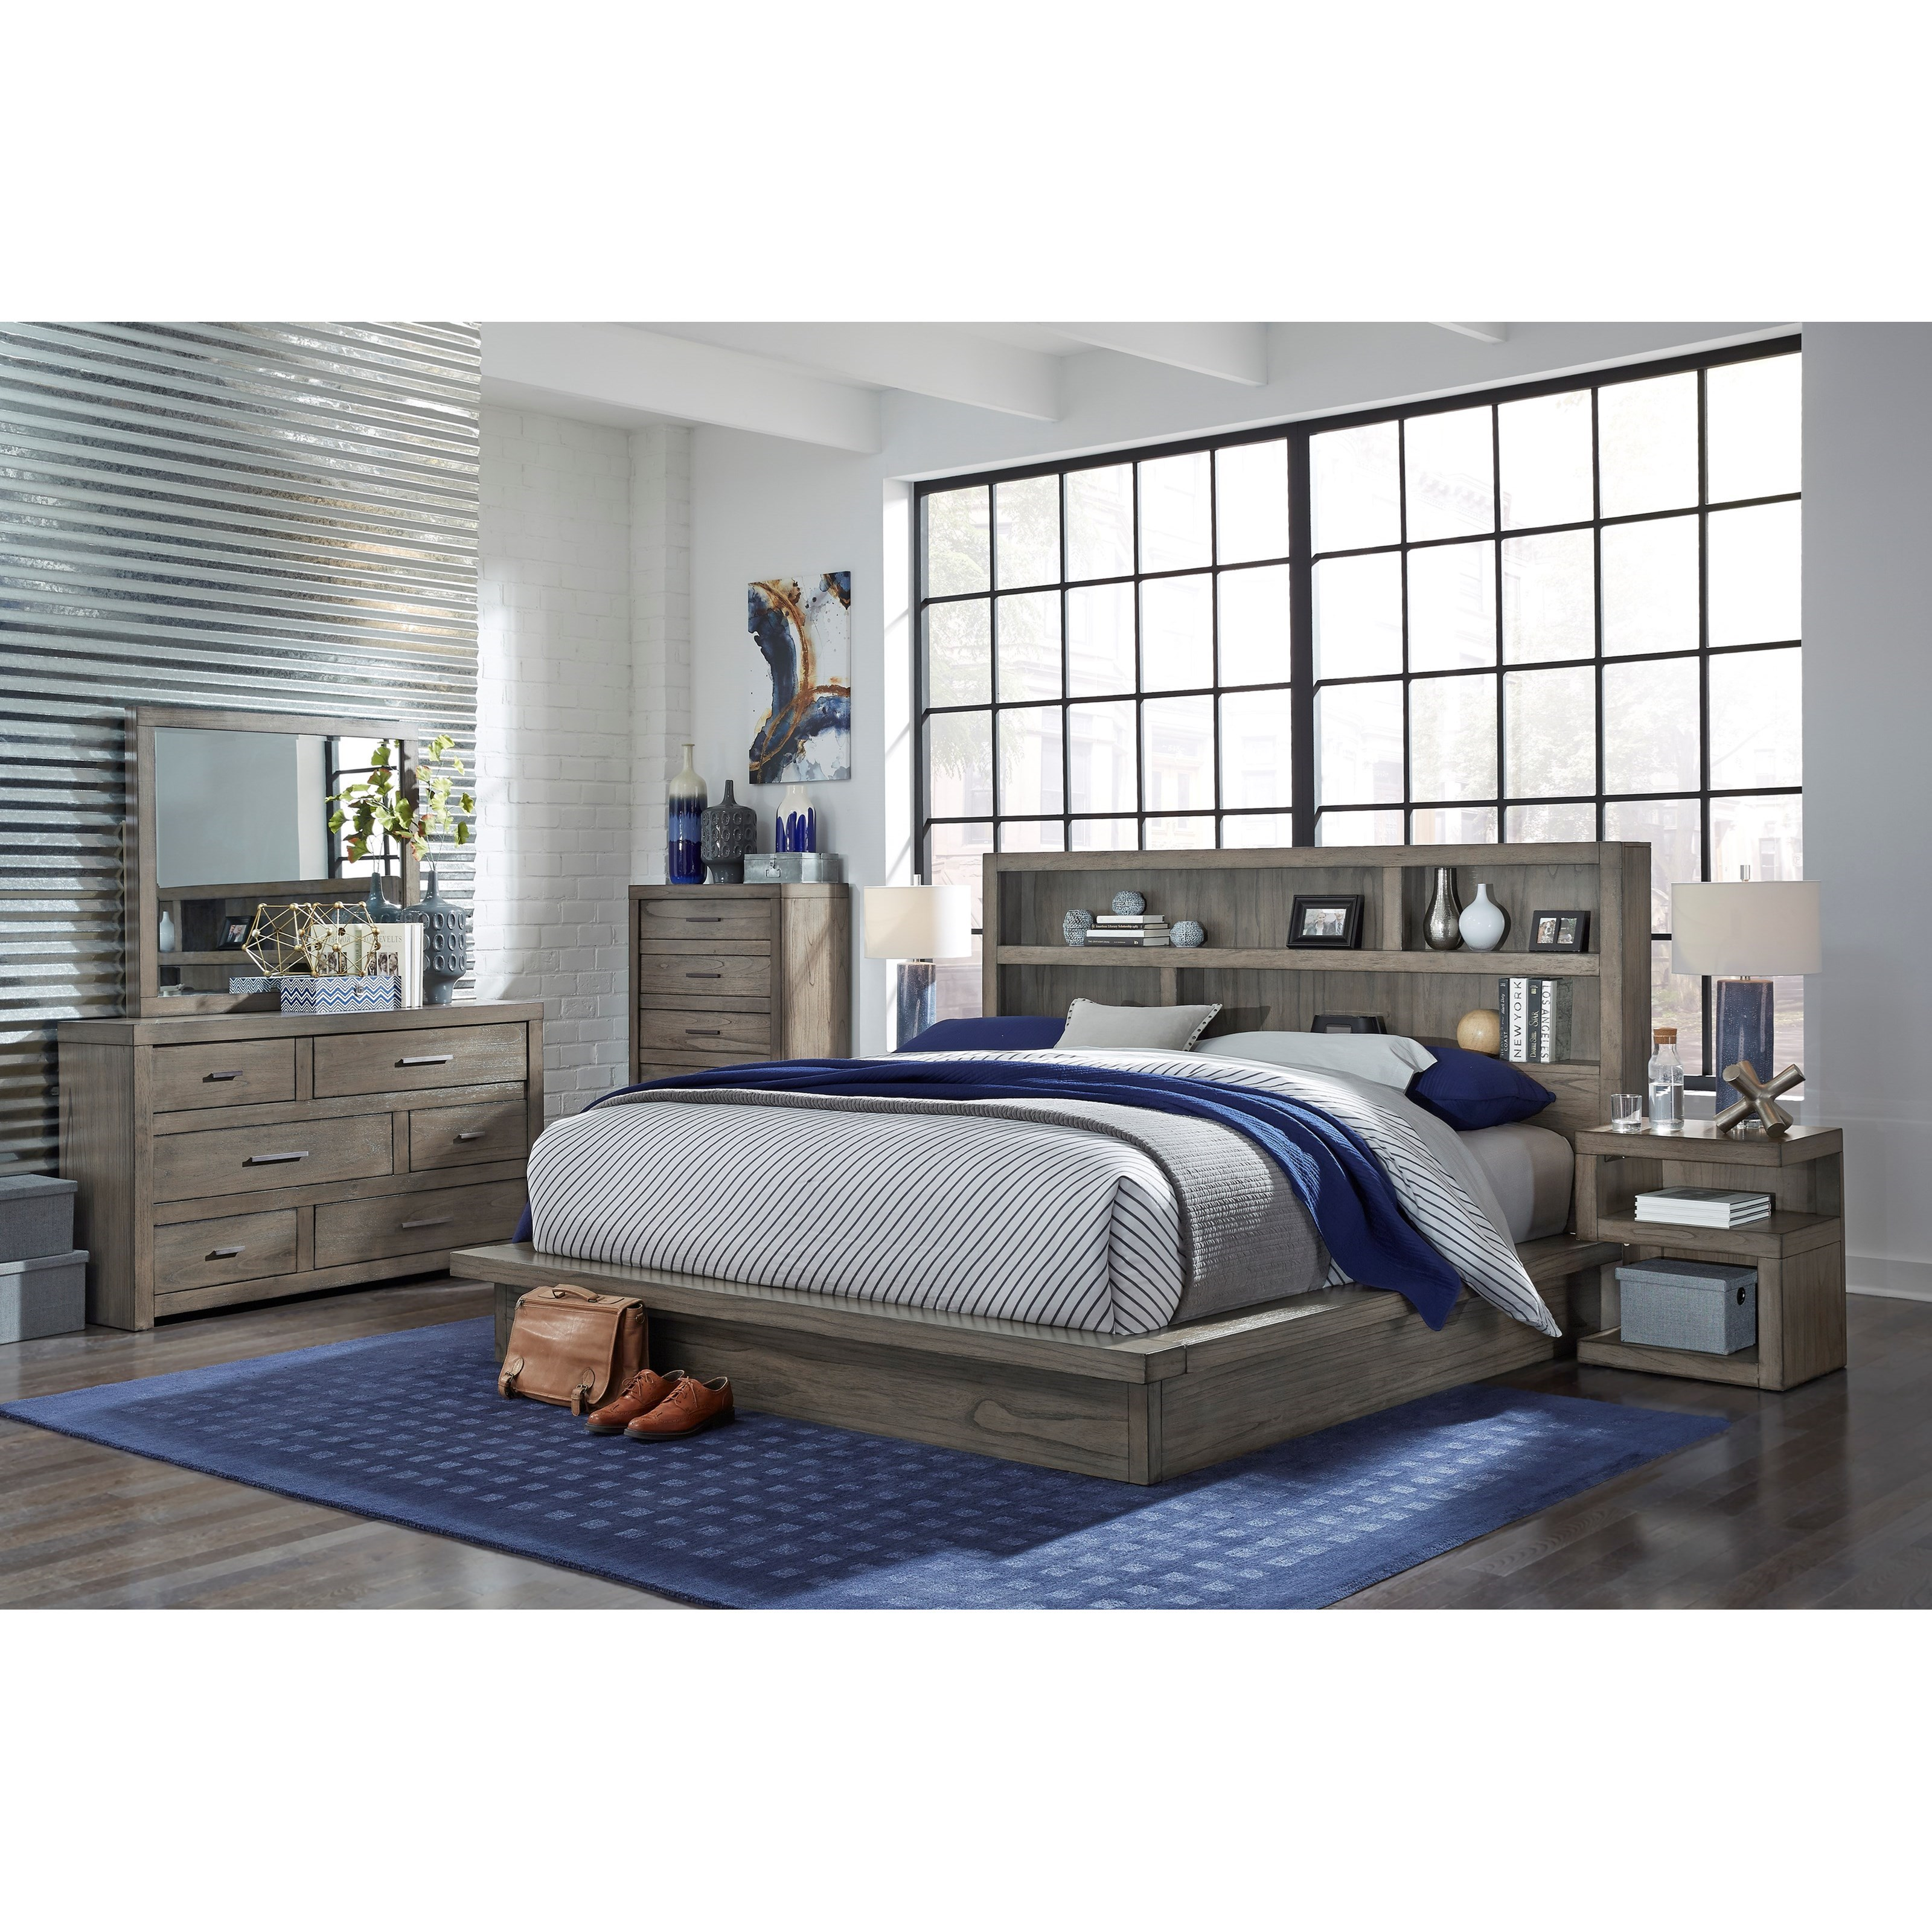 Aspenhome Modern Loft Iml Gry Ck Bedroom Group 4 California King Bedroom Group Dunk Bright Furniture Bedroom Groups